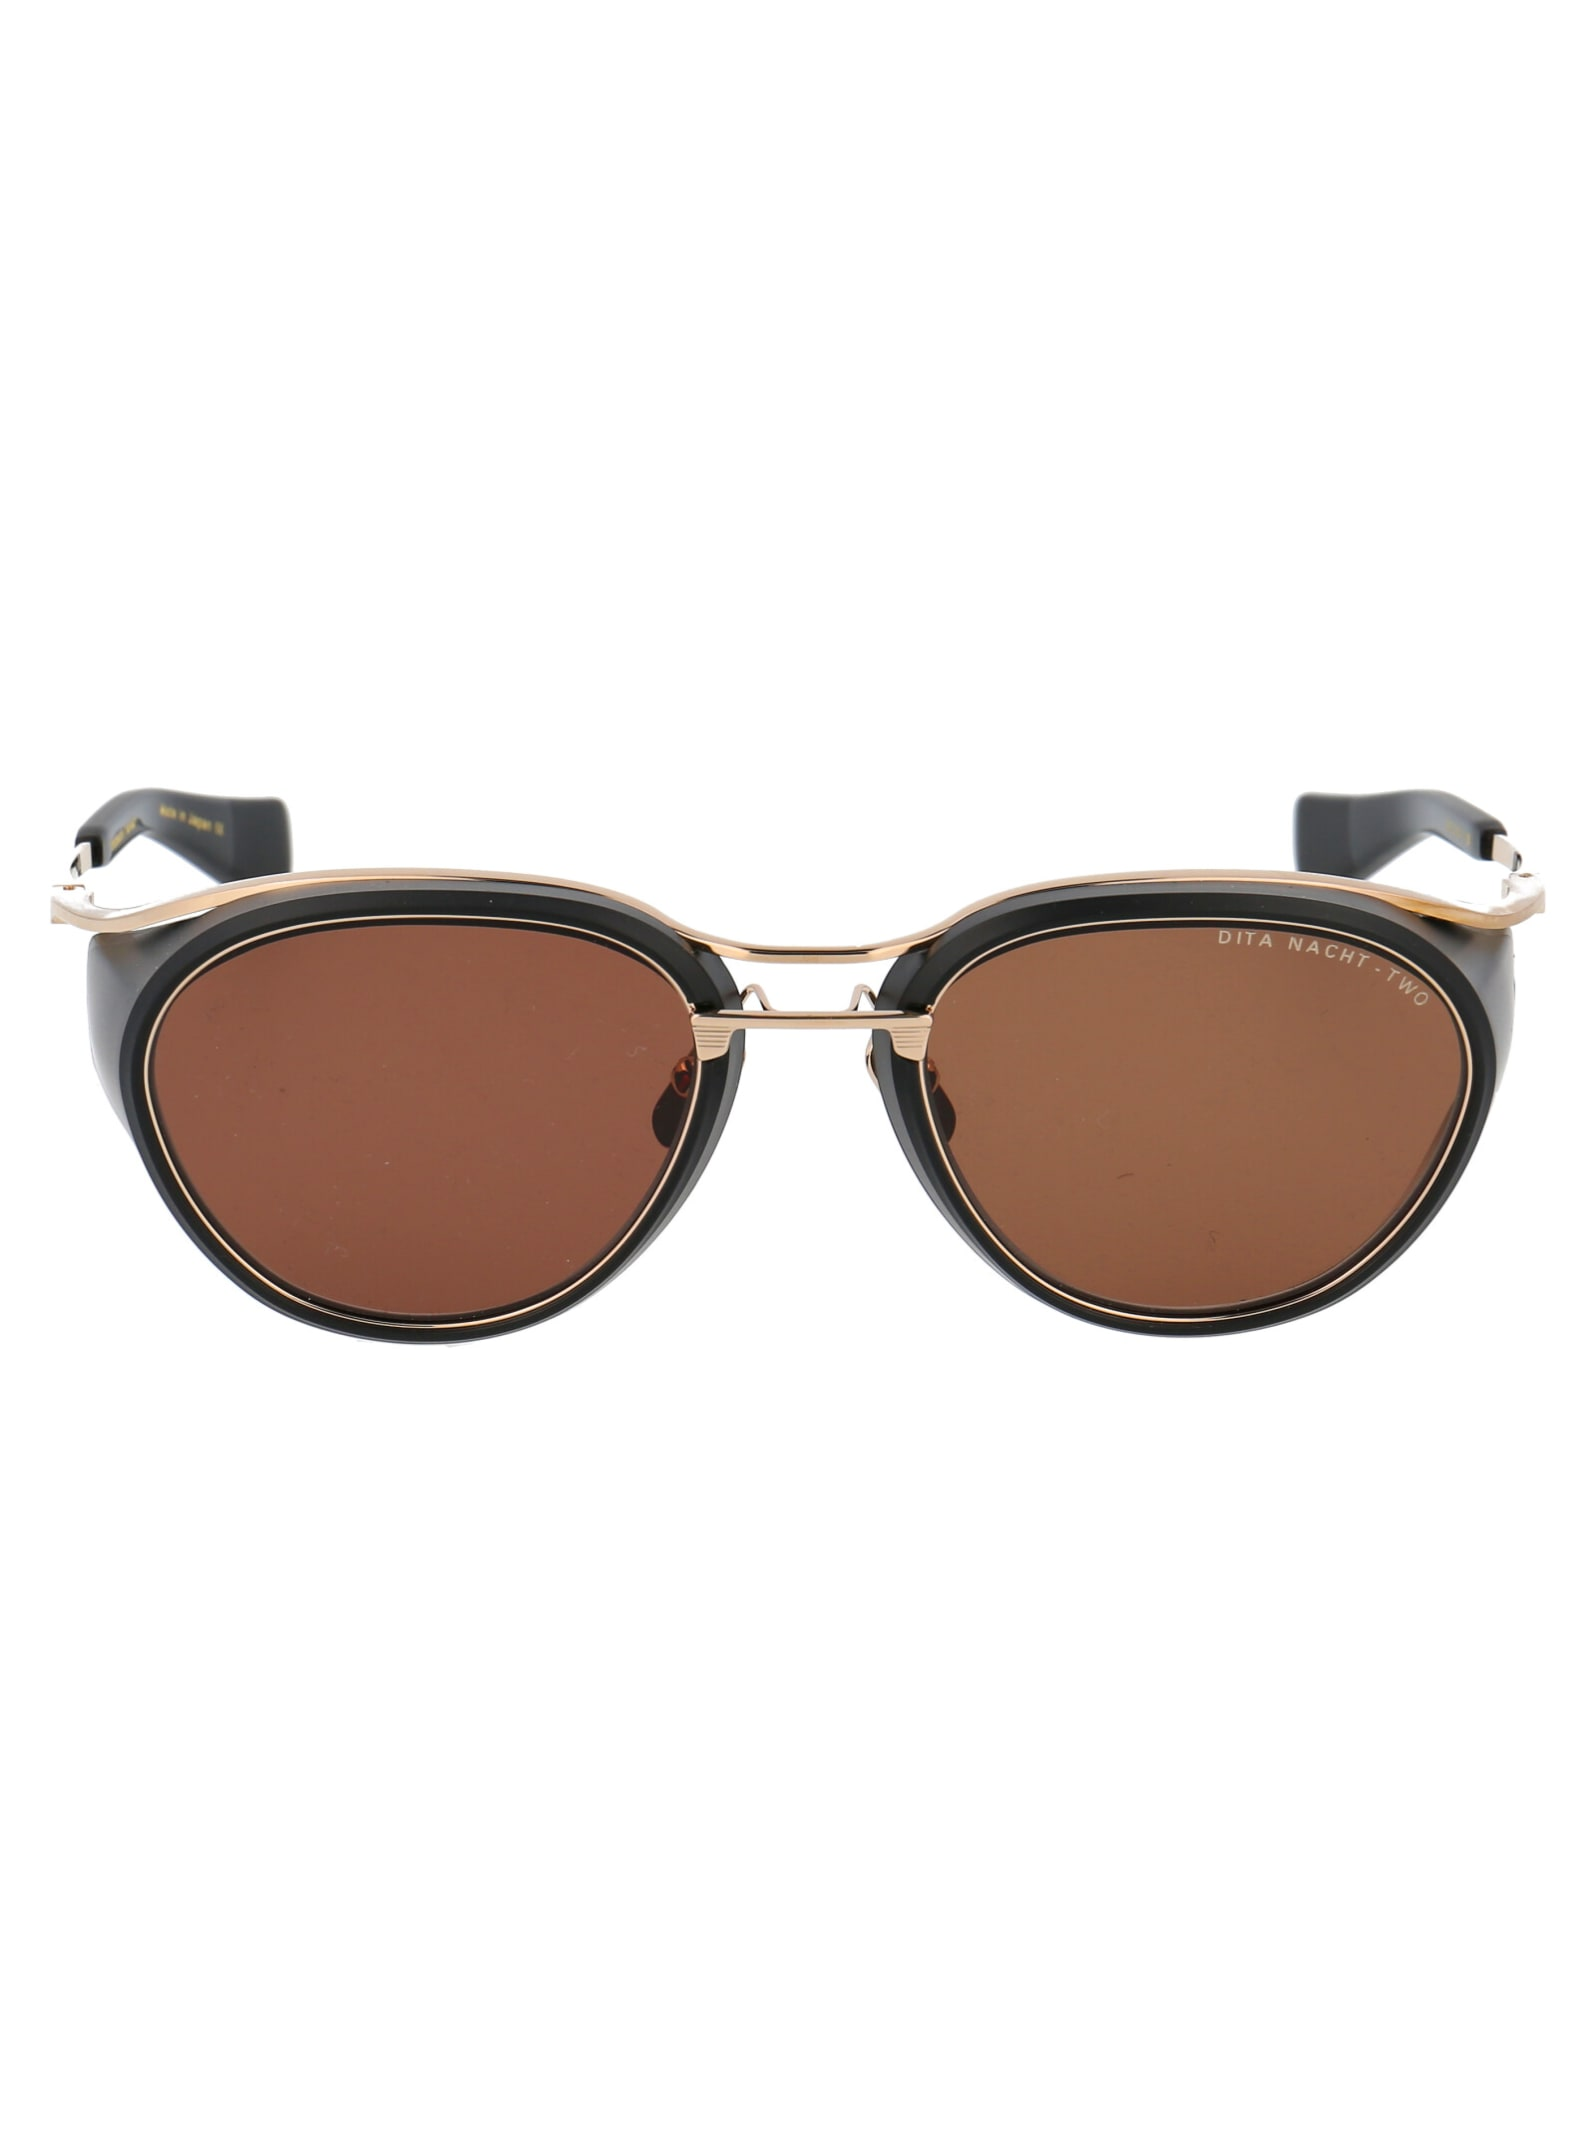 Nacht-two Sunglasses